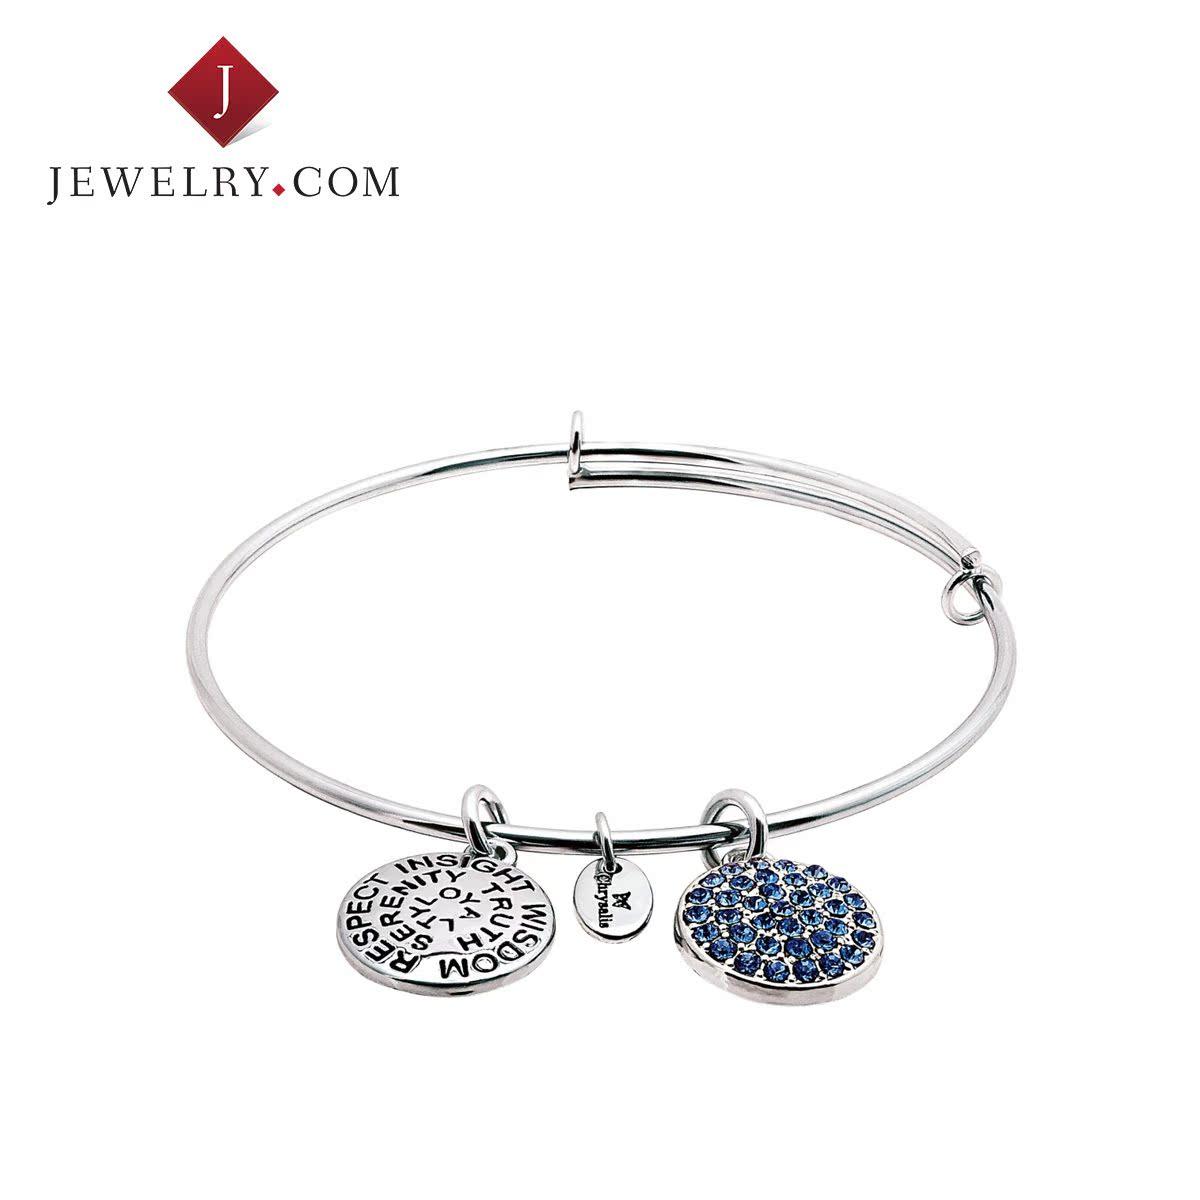 China Blue Swarovski Bracelet, China Blue Swarovski Bracelet